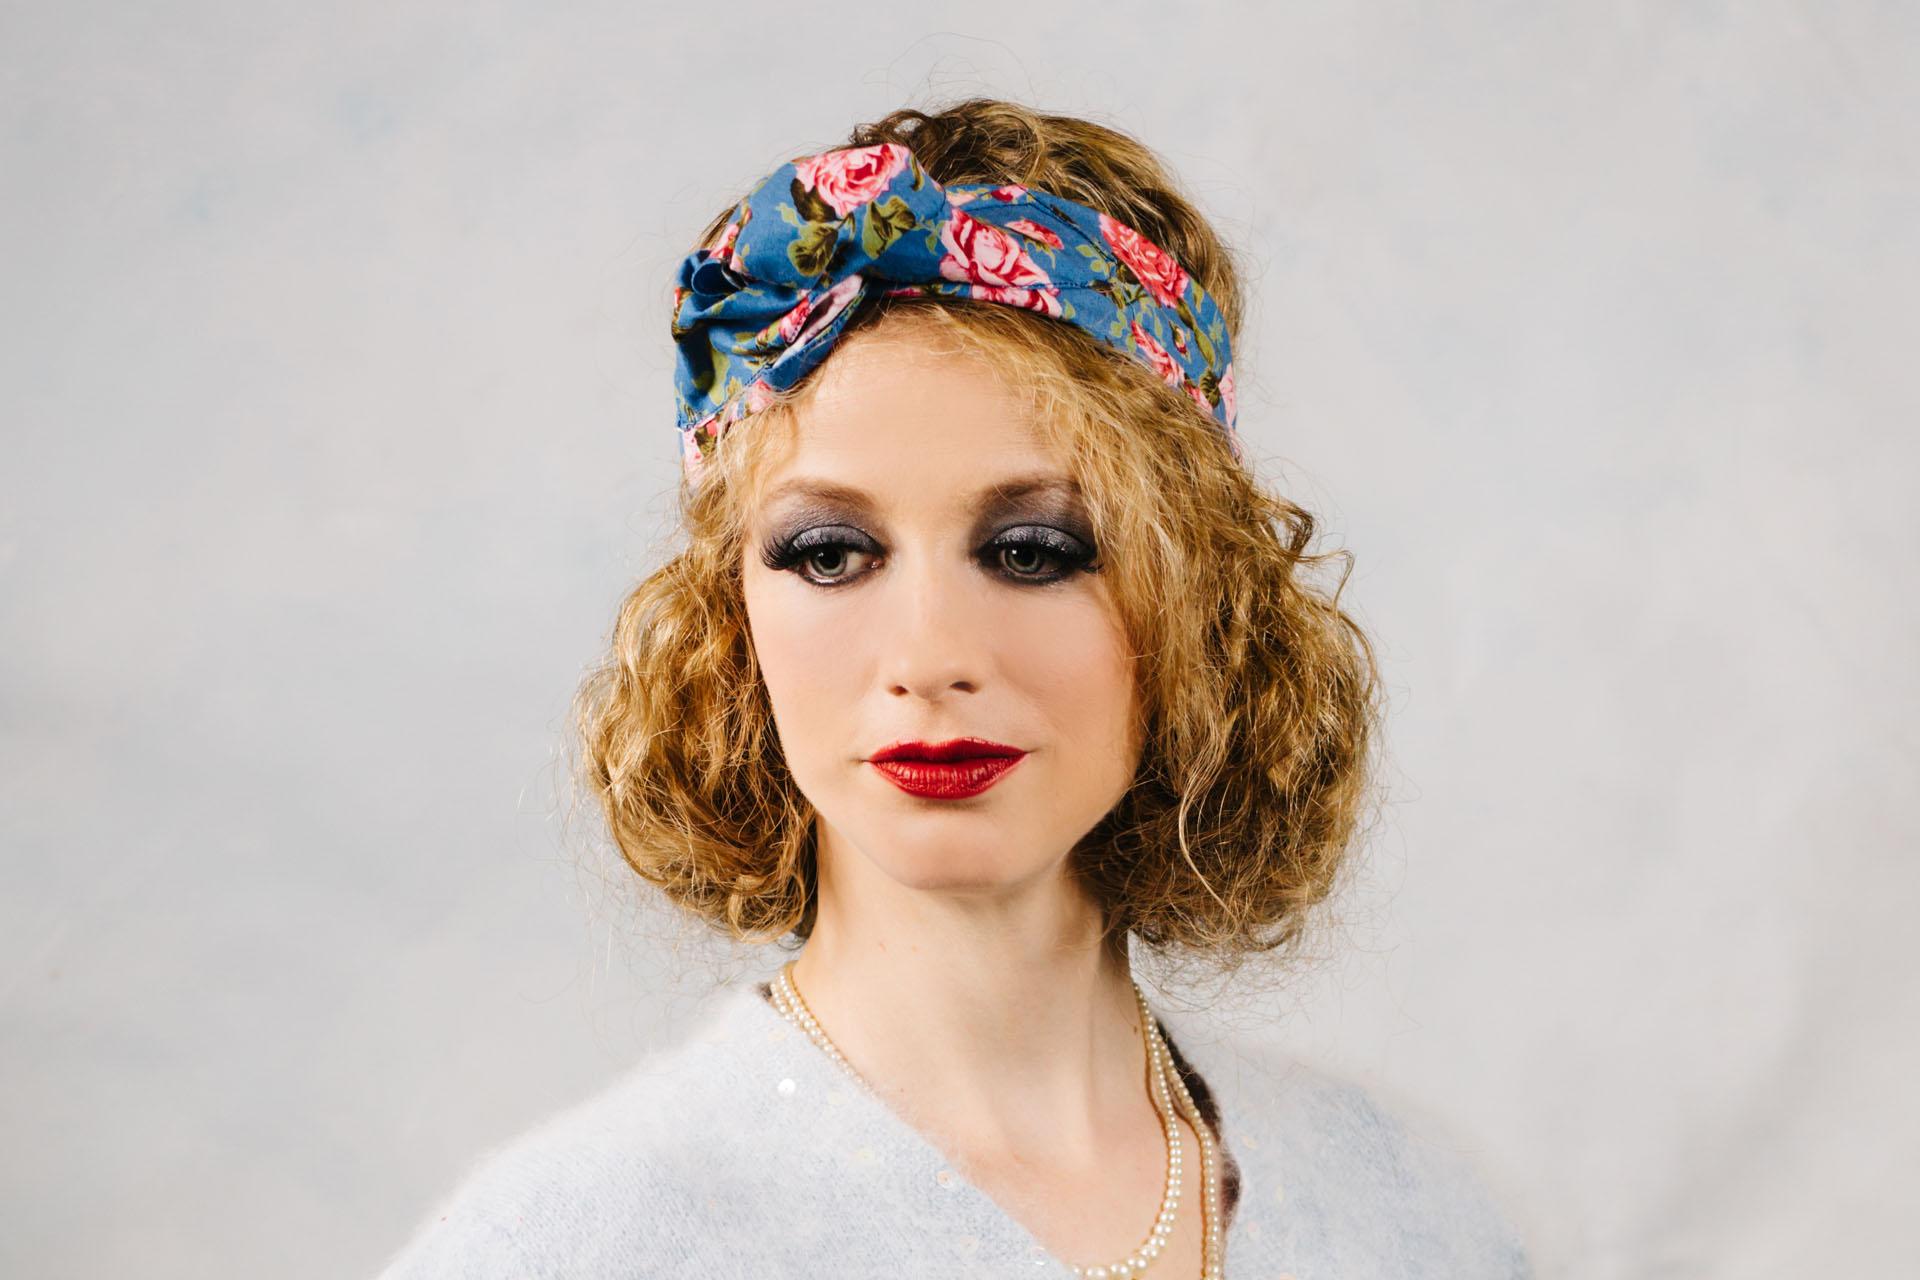 cath_kidston_headband_periwinkle_blue_floral